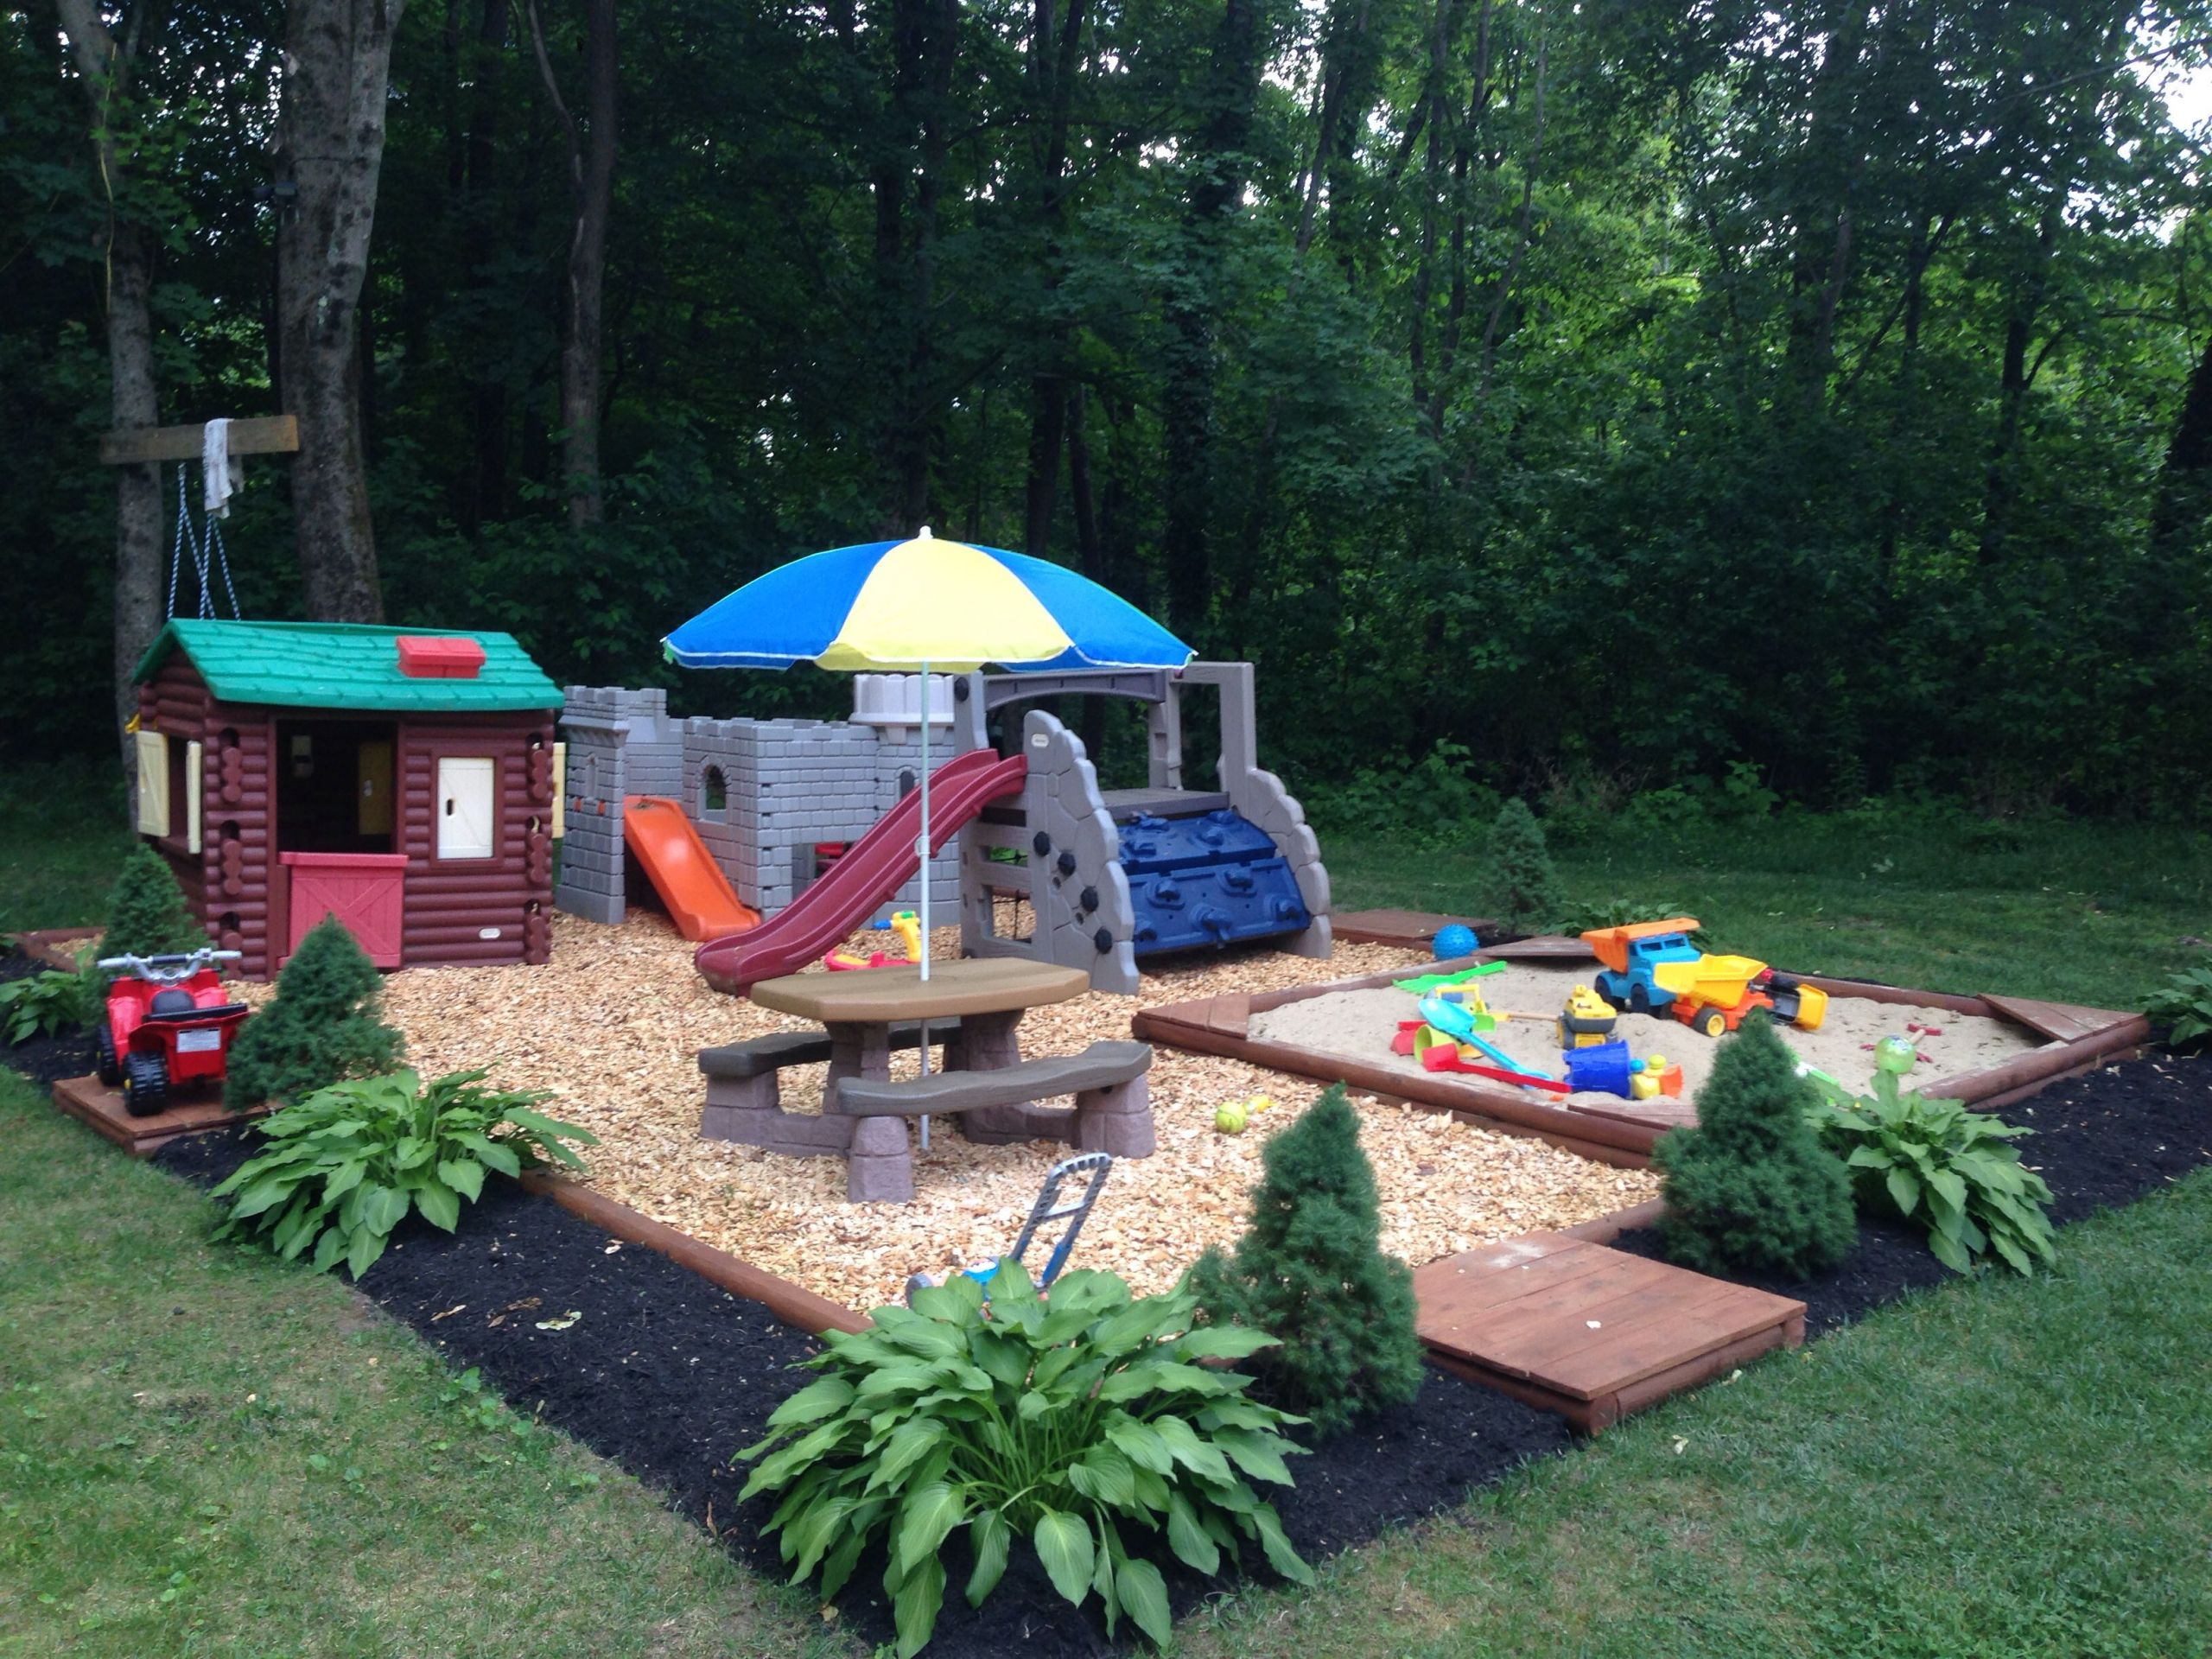 Kids Outdoor Play area Awesome Backyard Play area